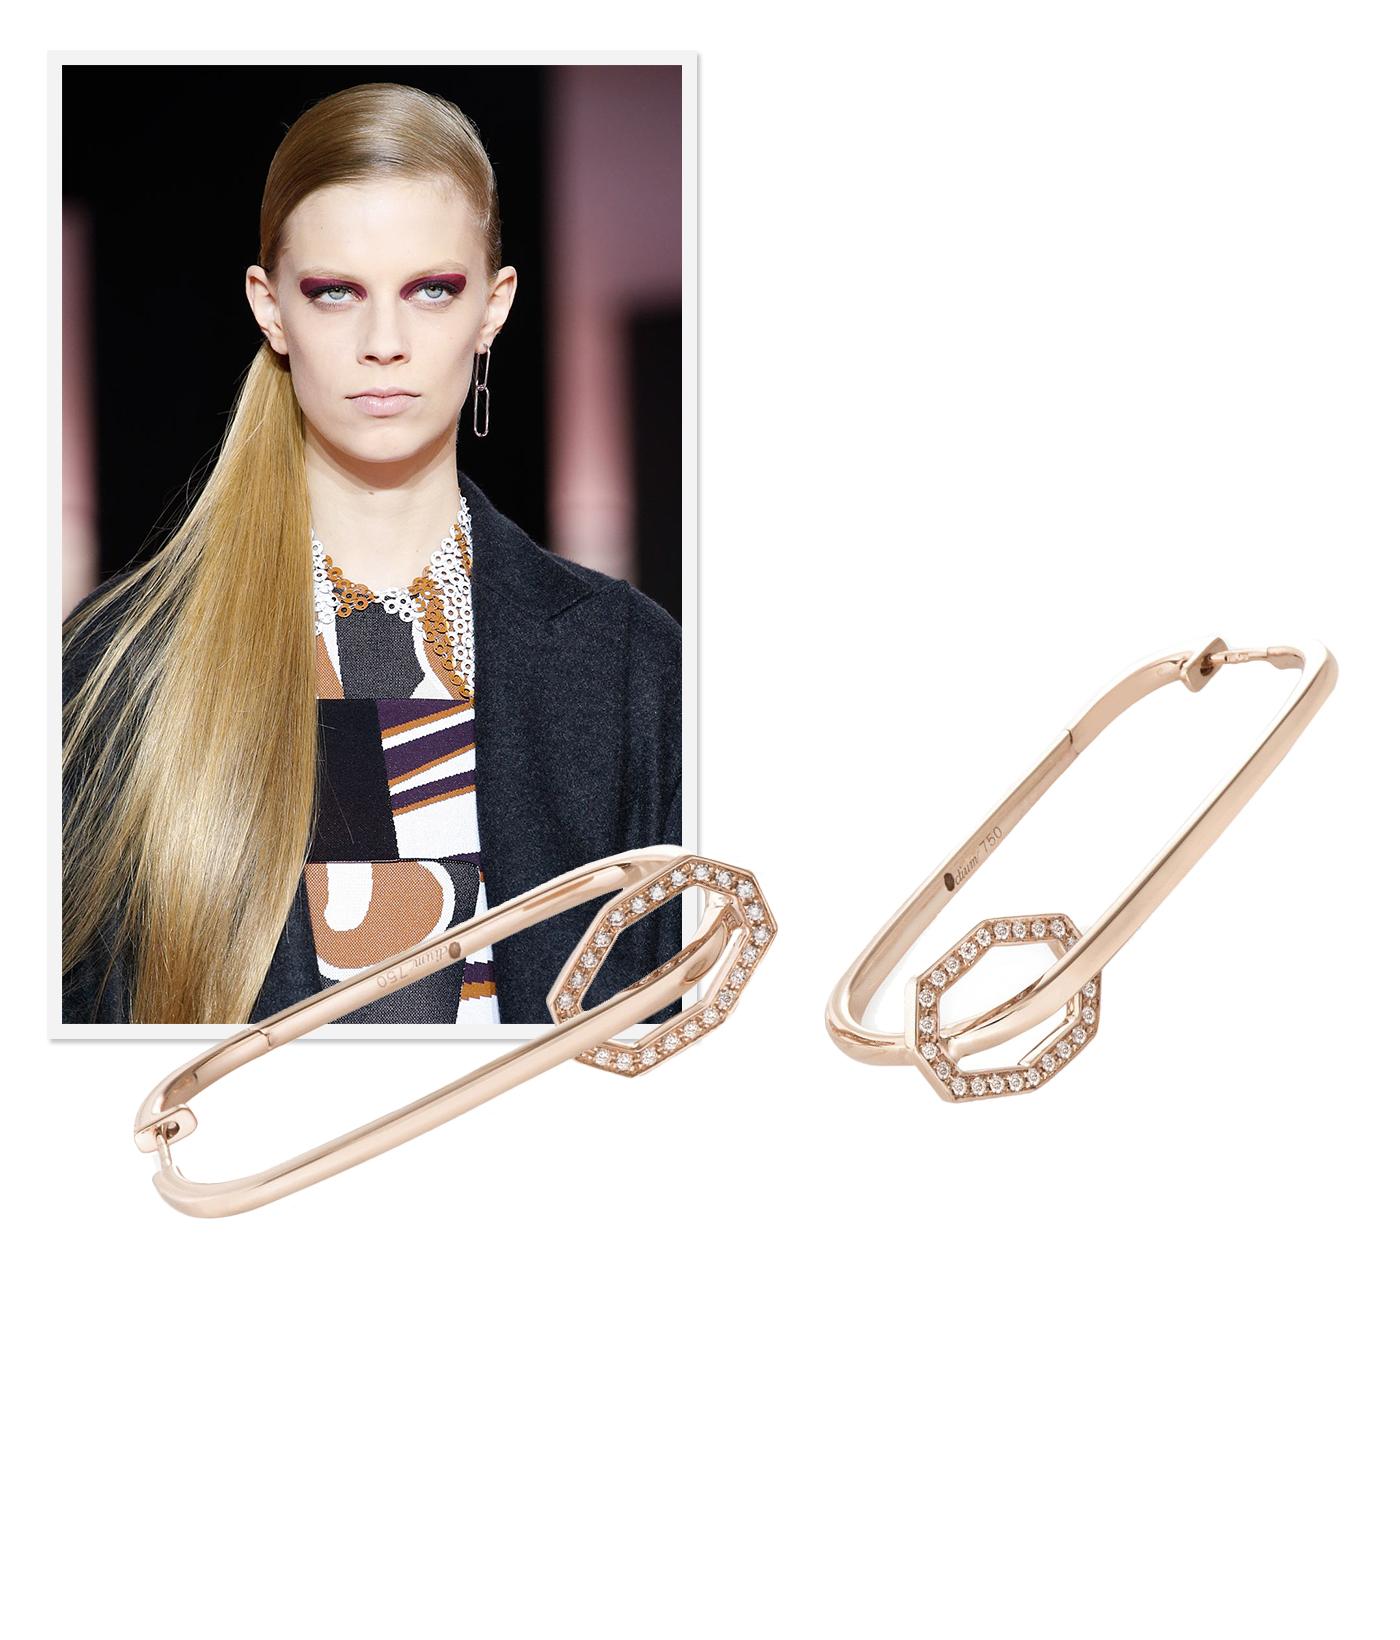 jewelry-trends-fall-2015-runway-07.jpg